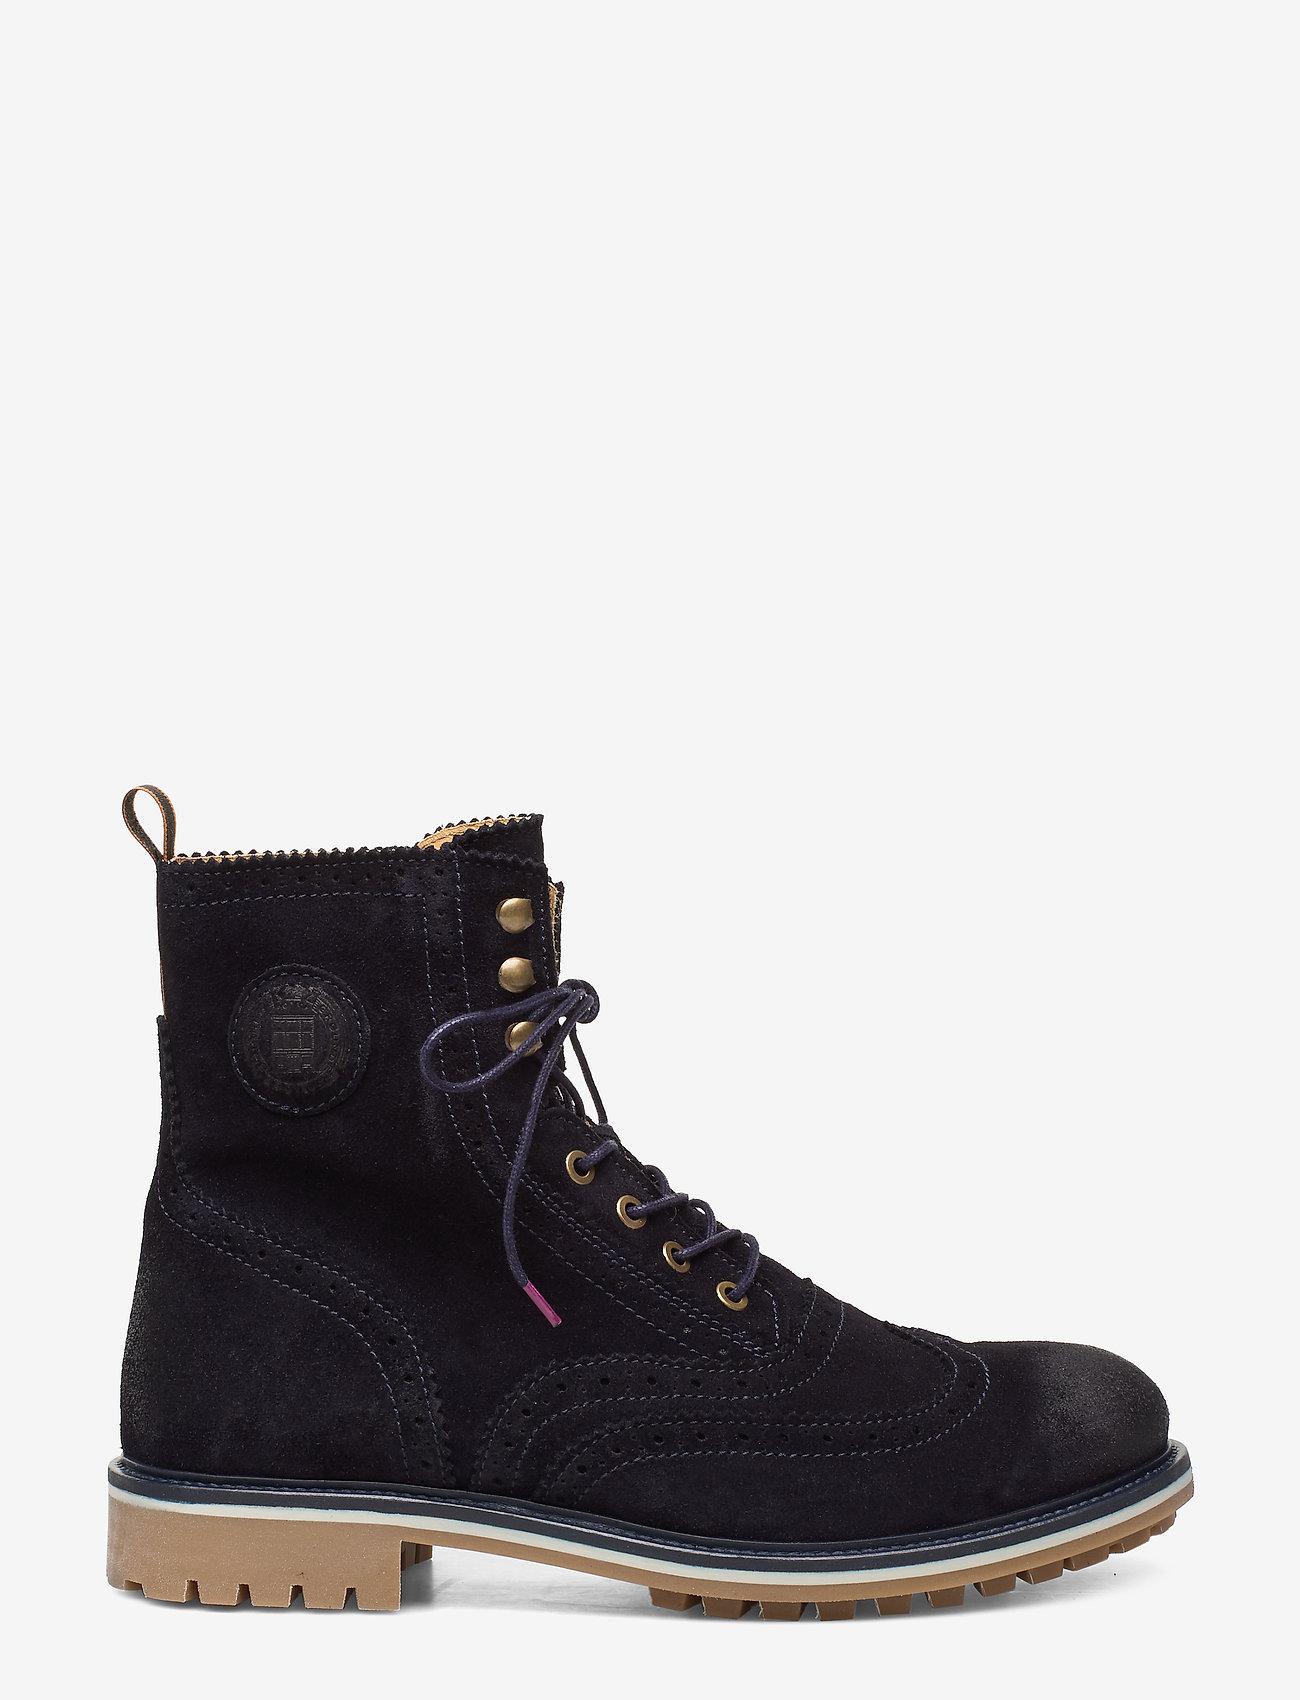 Scotch & Soda Shoes - Borrel Mid laceboot - bottes lacées - marine - 1